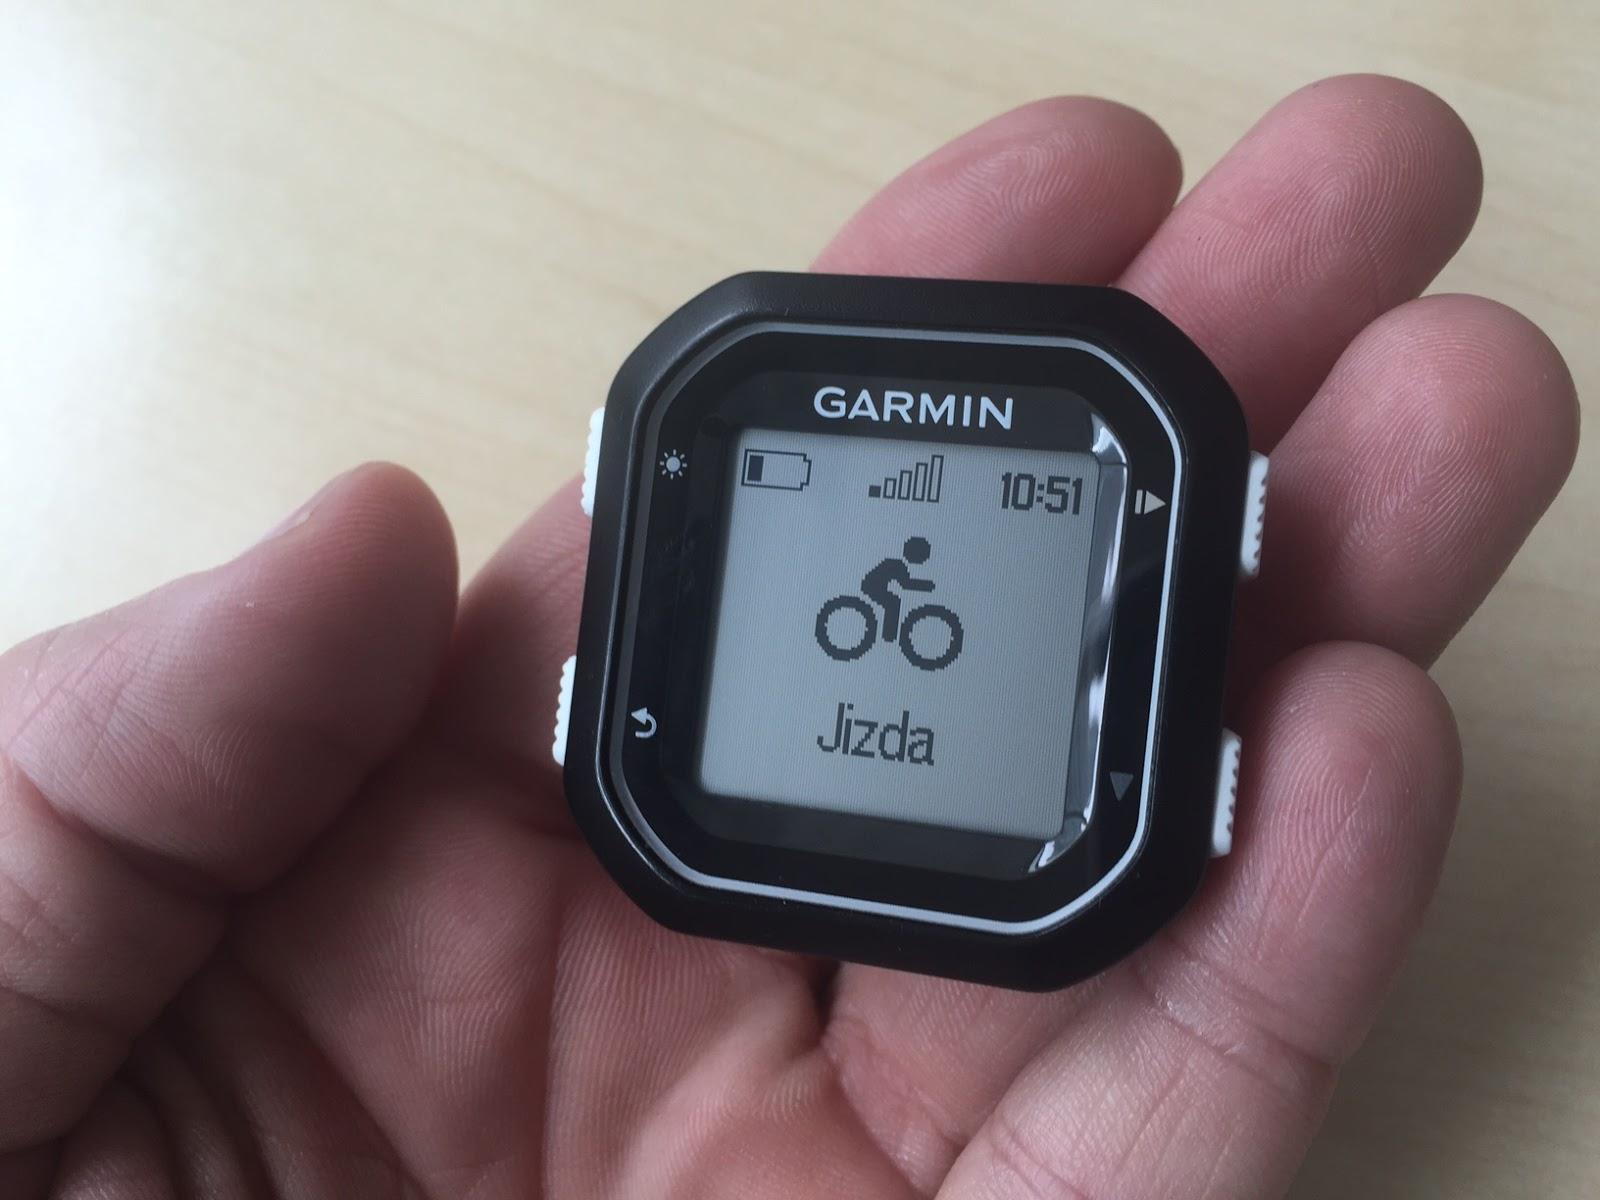 gone4run run race fun recenze garmin edge 25. Black Bedroom Furniture Sets. Home Design Ideas